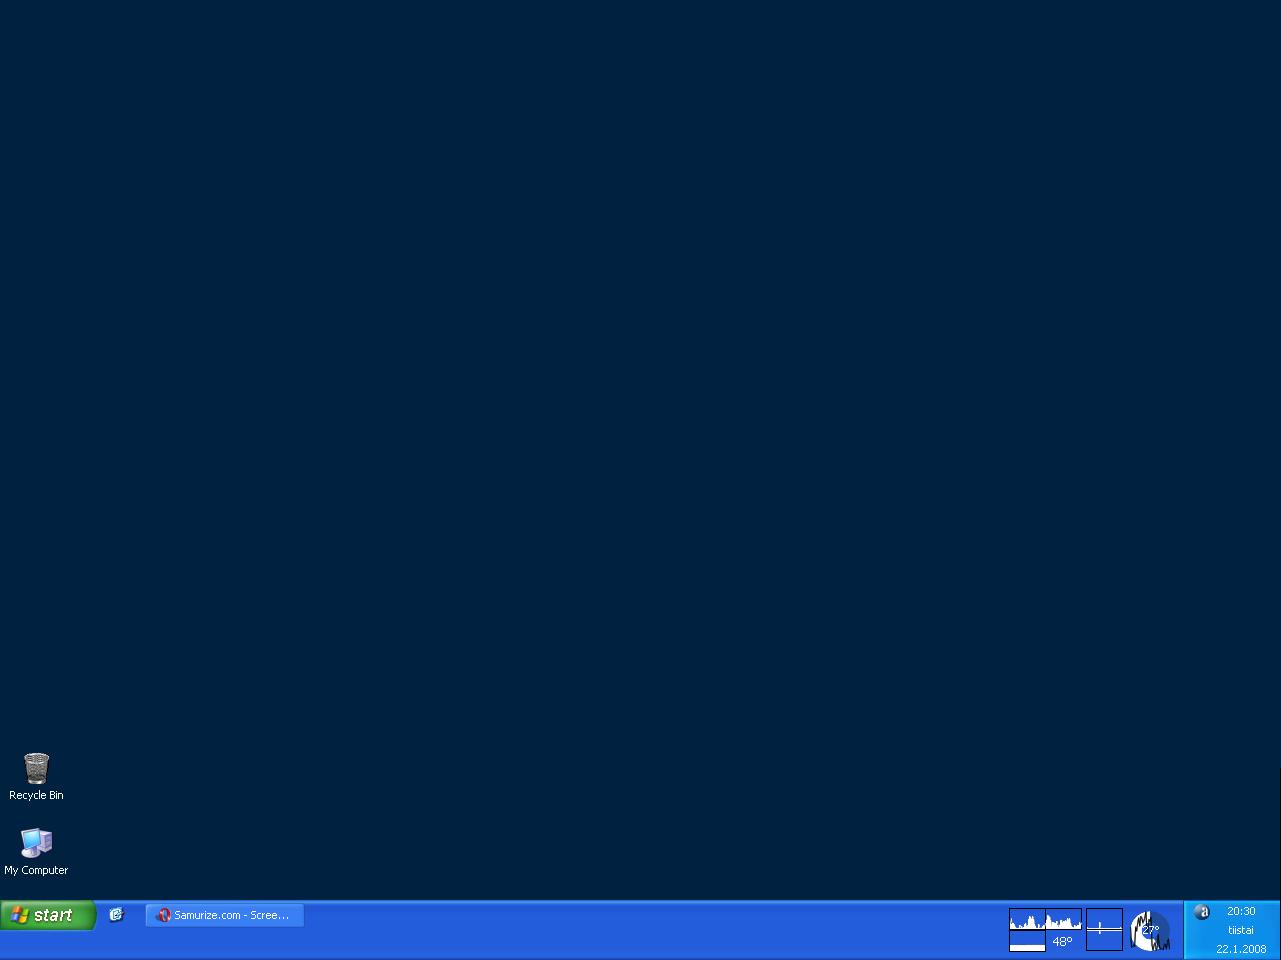 Title: My desktop at 22.1.2008